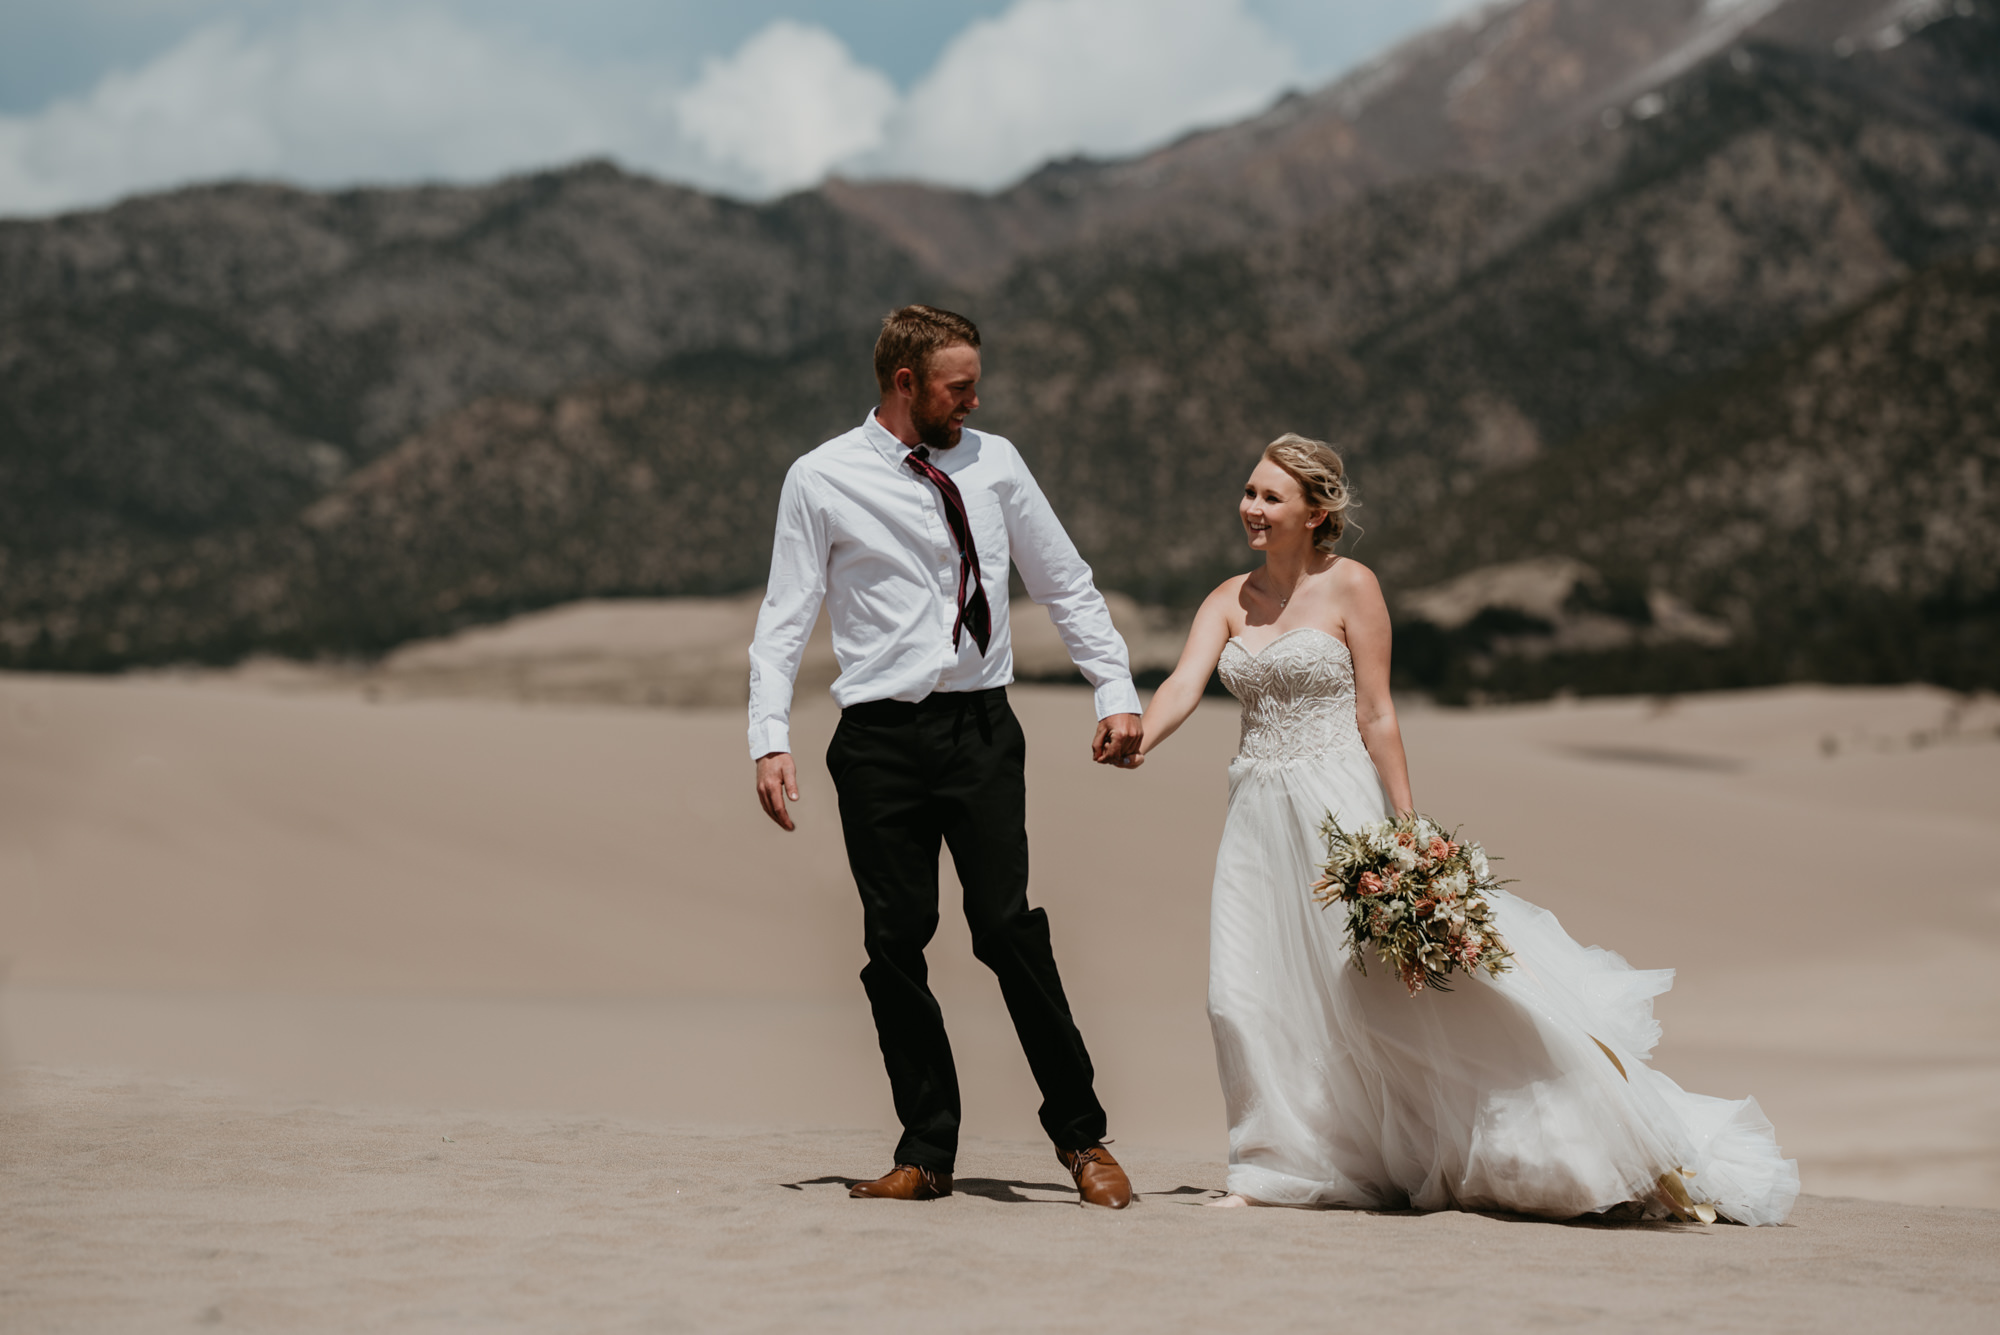 Doug and Kaitlyn walk hand in hand across the sand dunes.